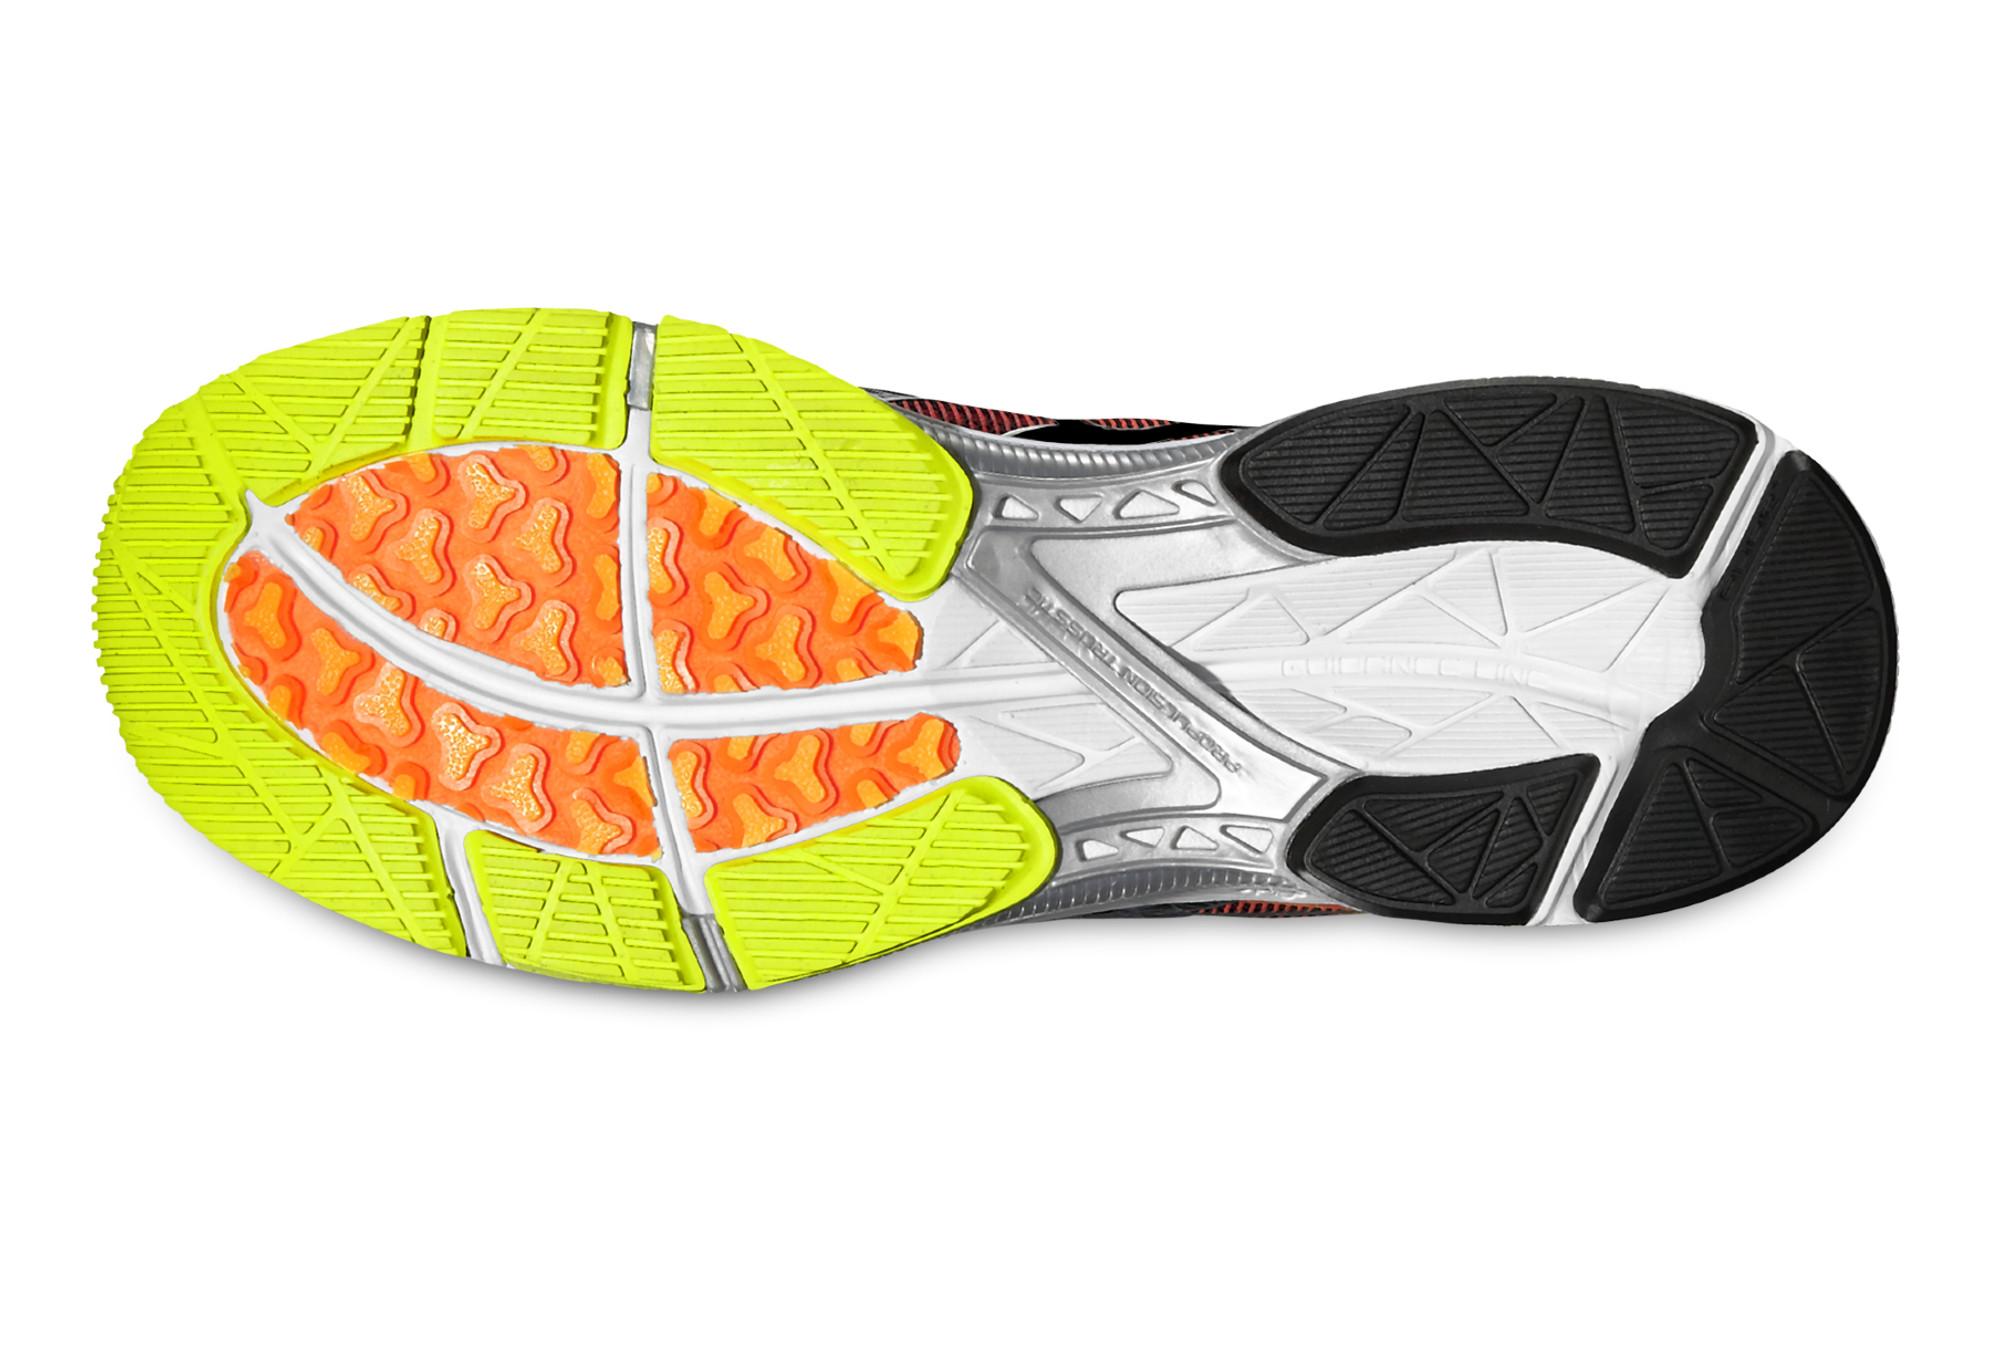 chaussures running homme asics gel ds trainer 21 jaune asics